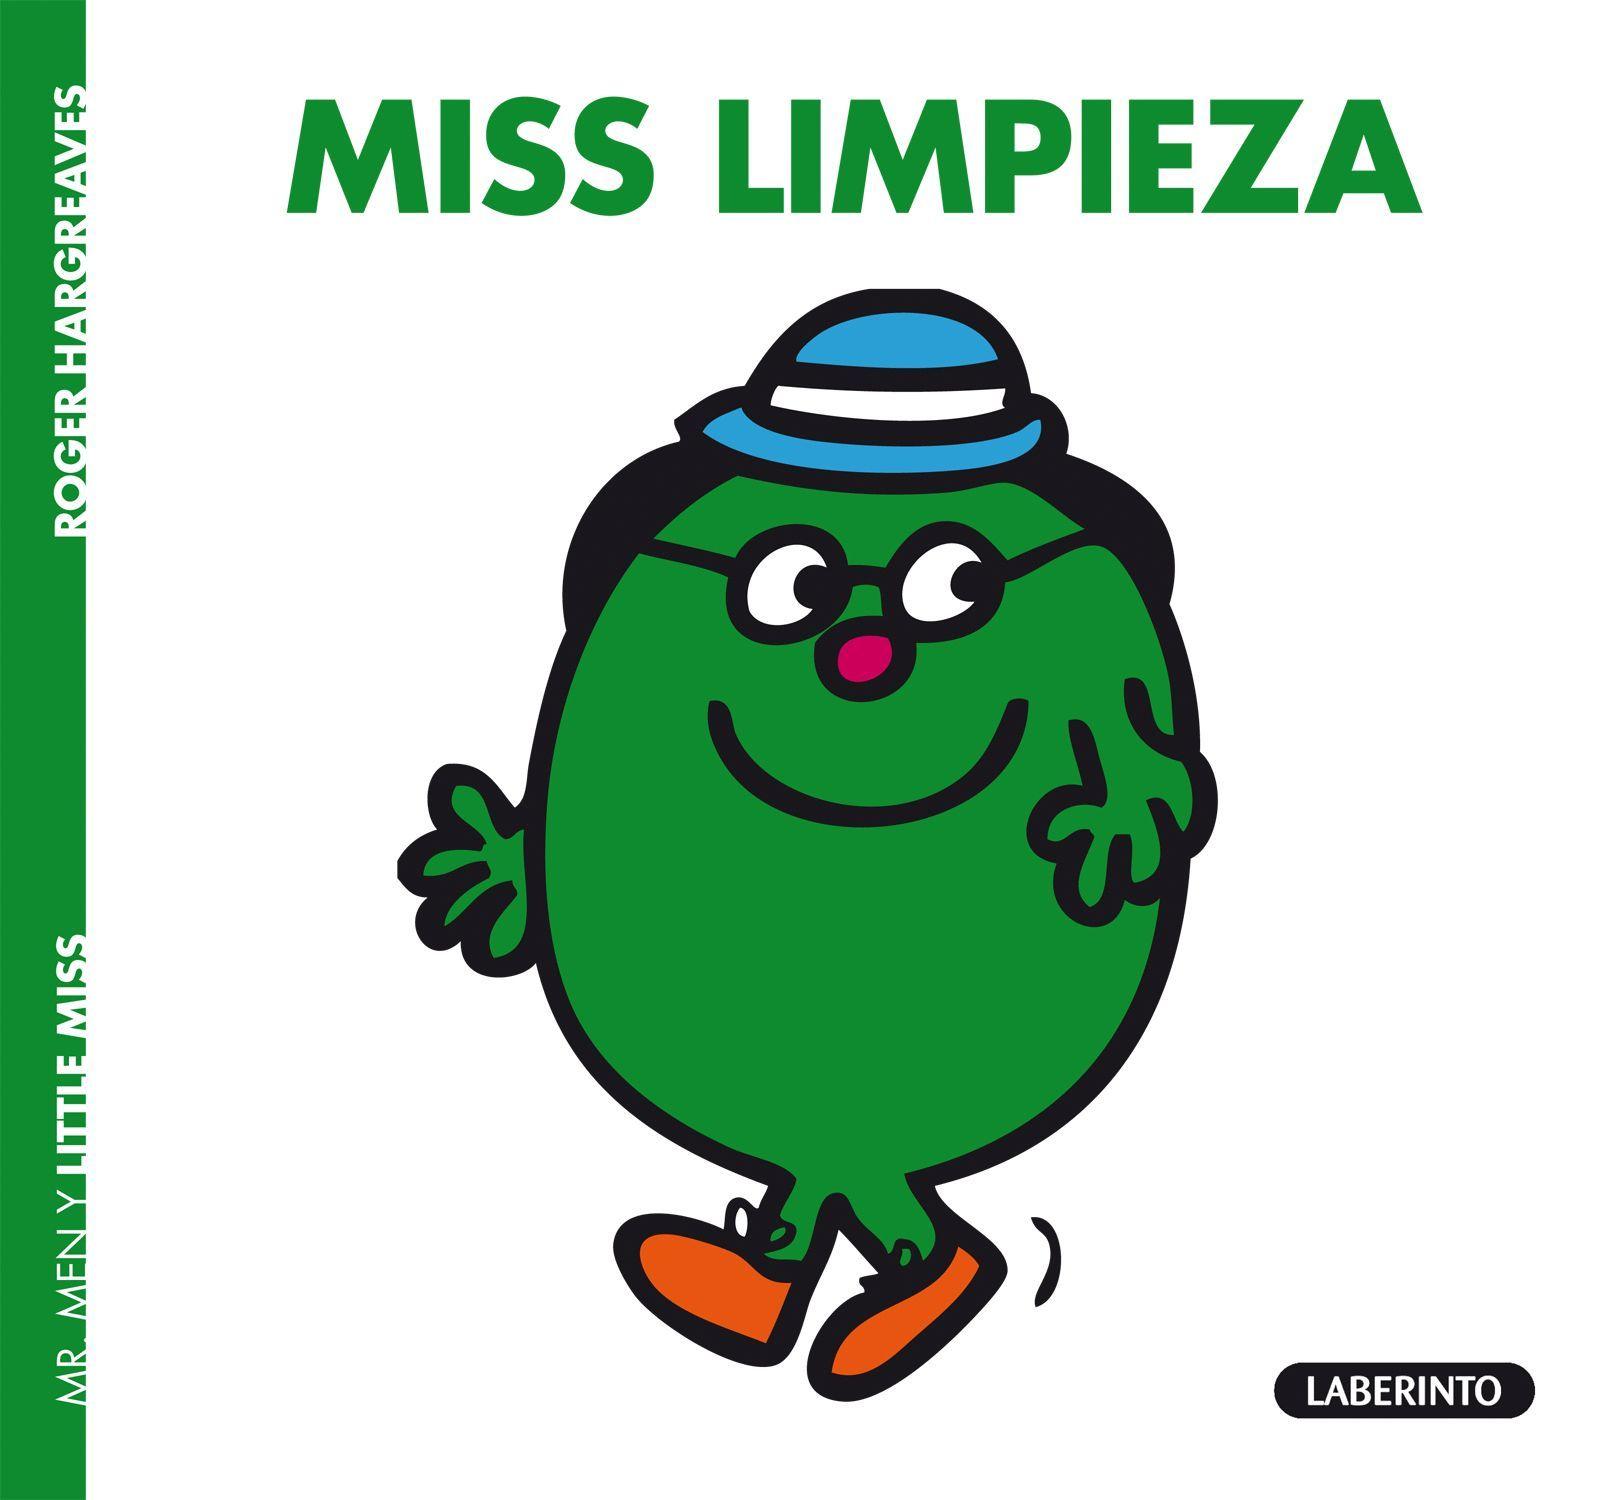 MISS LIMPIEZA